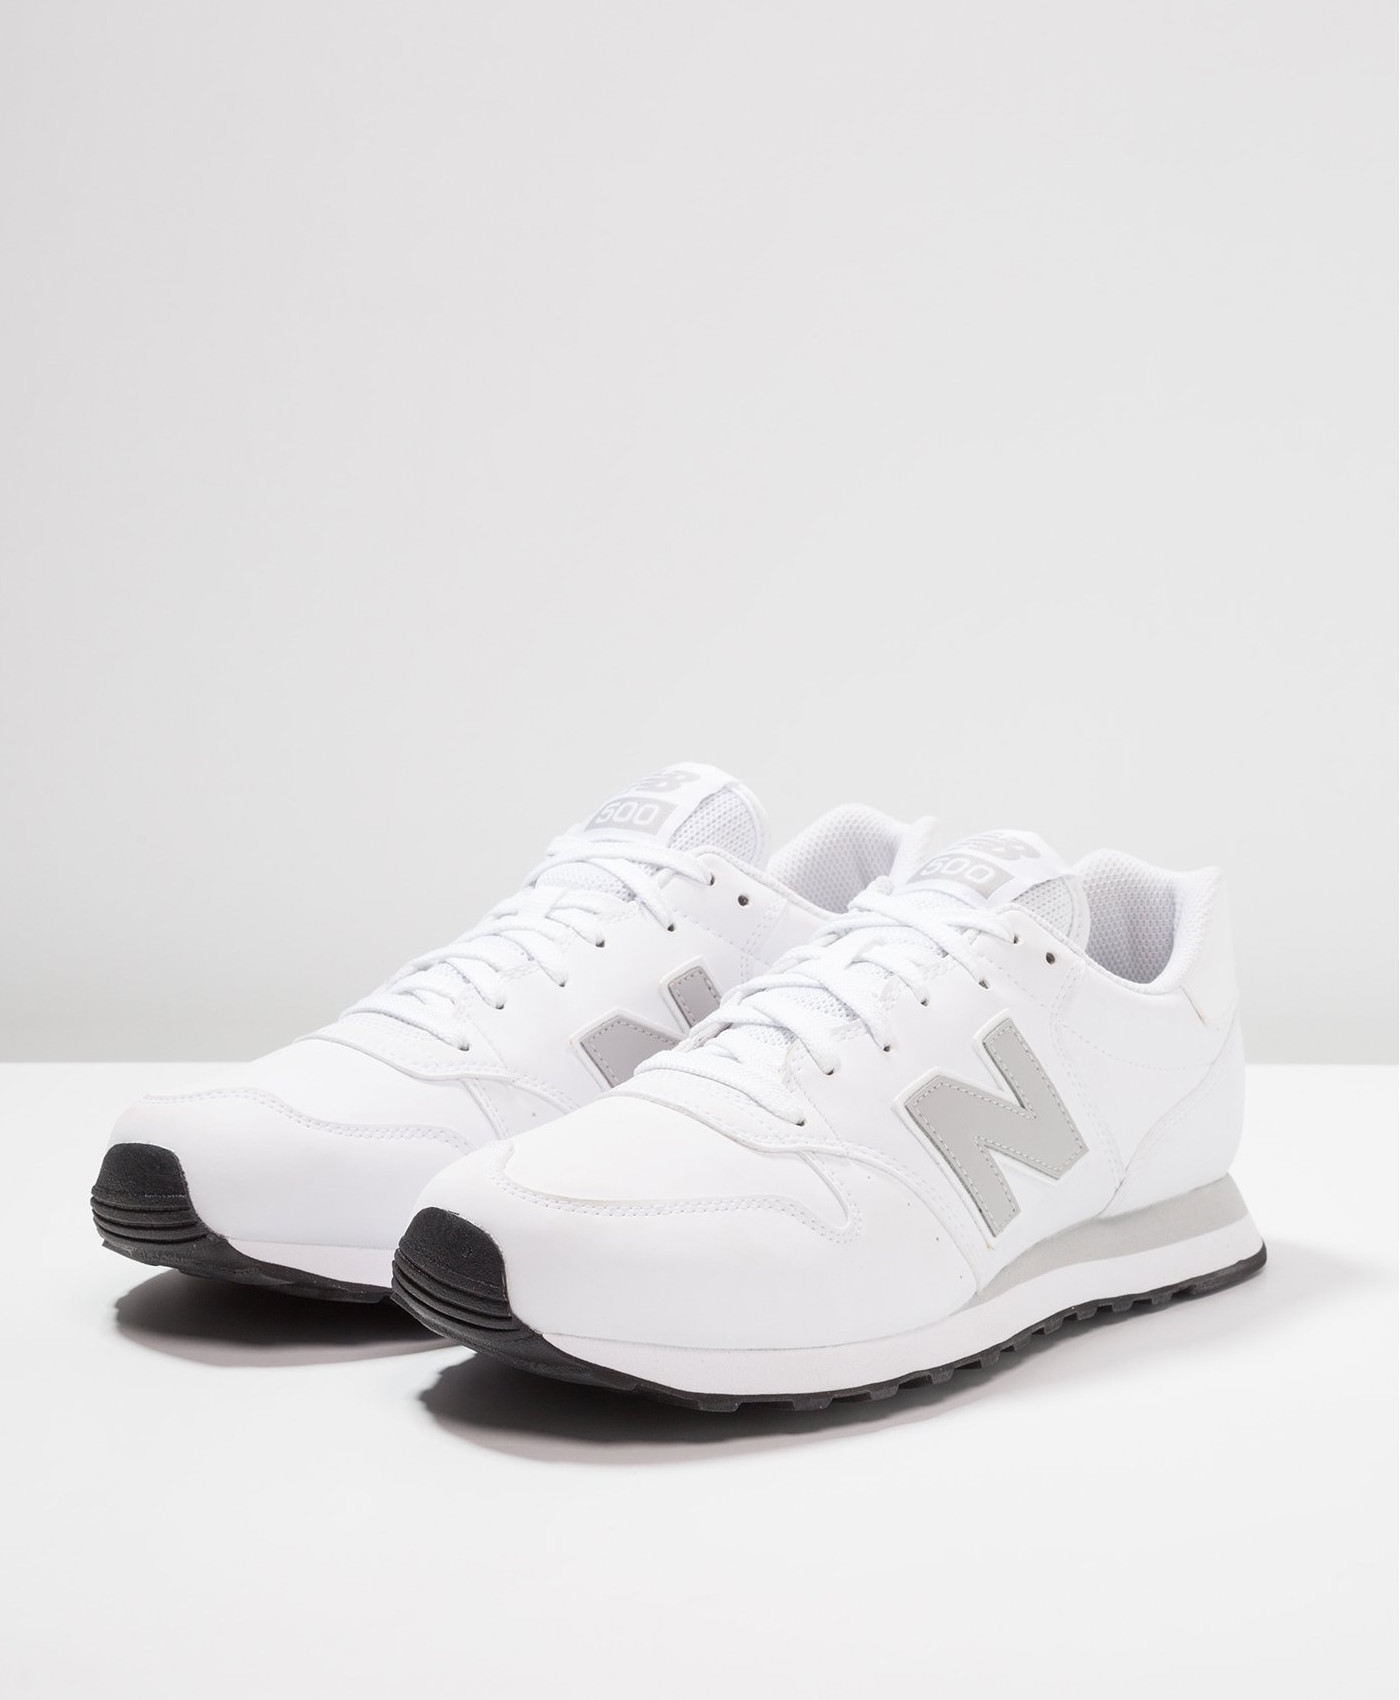 "brand new aa079 63cd5 New Balance Gm 500 Zapatos Zapatos Zapatos Zapatillas Deporteive  deporteswear lifestyle Bianco Plata fd96d3. """